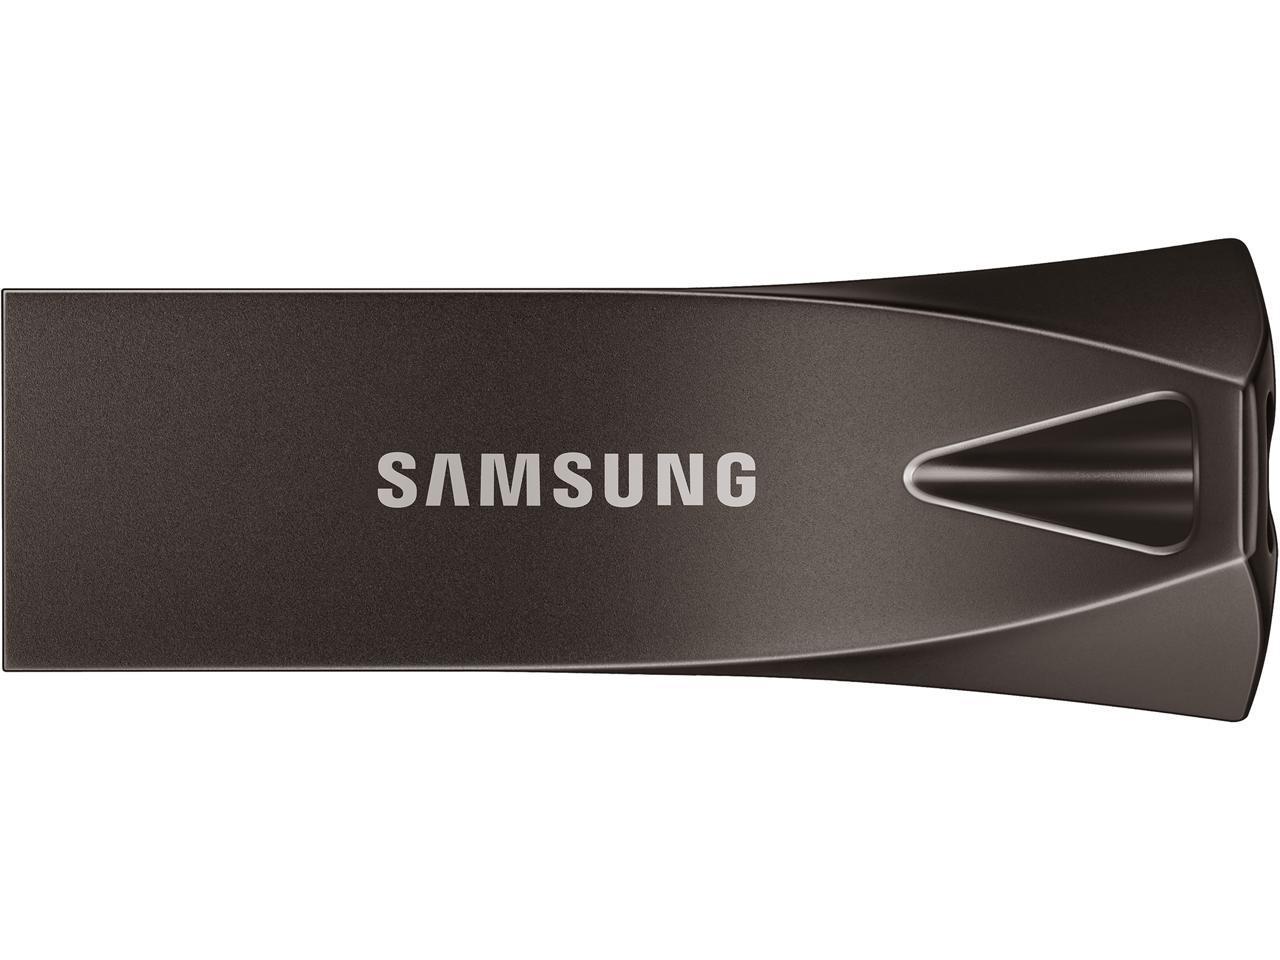 128GB Samsung Bar Plus USB 3.1 Flash Drive  @newegg $18